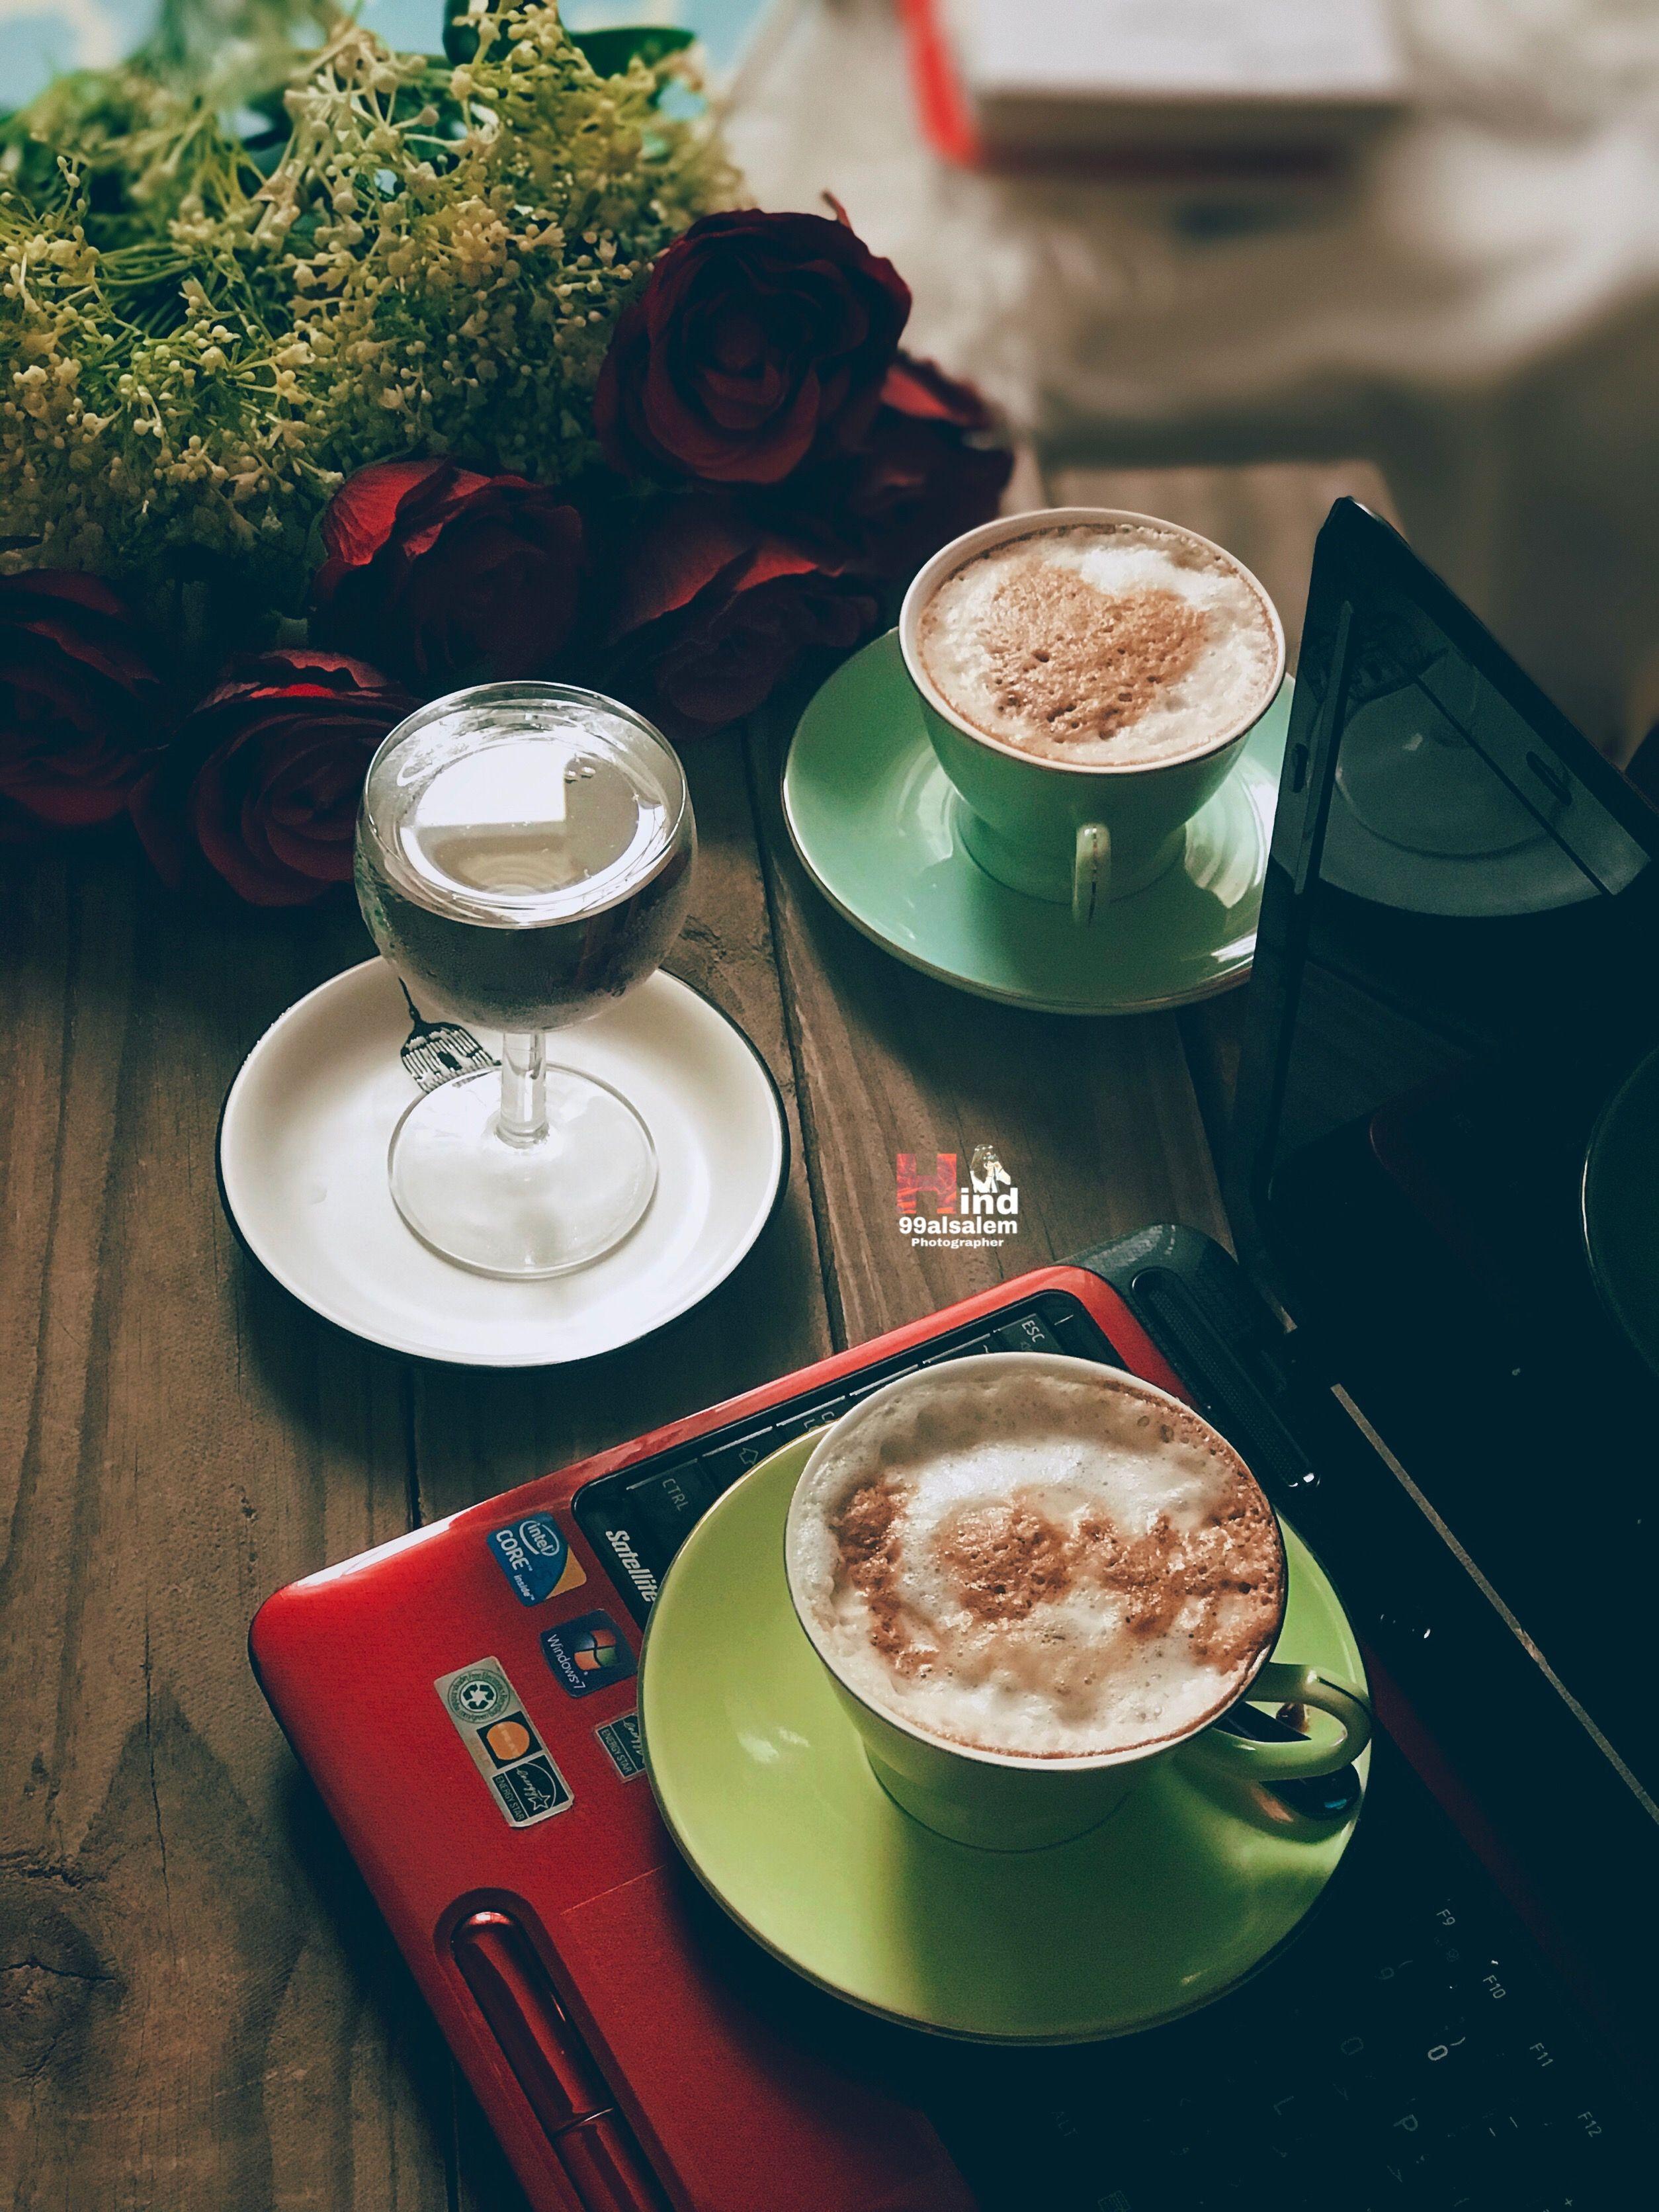 دعاء صورة افكار تصوير احترافيه Coffee Coffeetime قهوه كوفي تكوين عدسه سناب Pictures كلام كلمات حب عشق Glassware Tableware Pixel